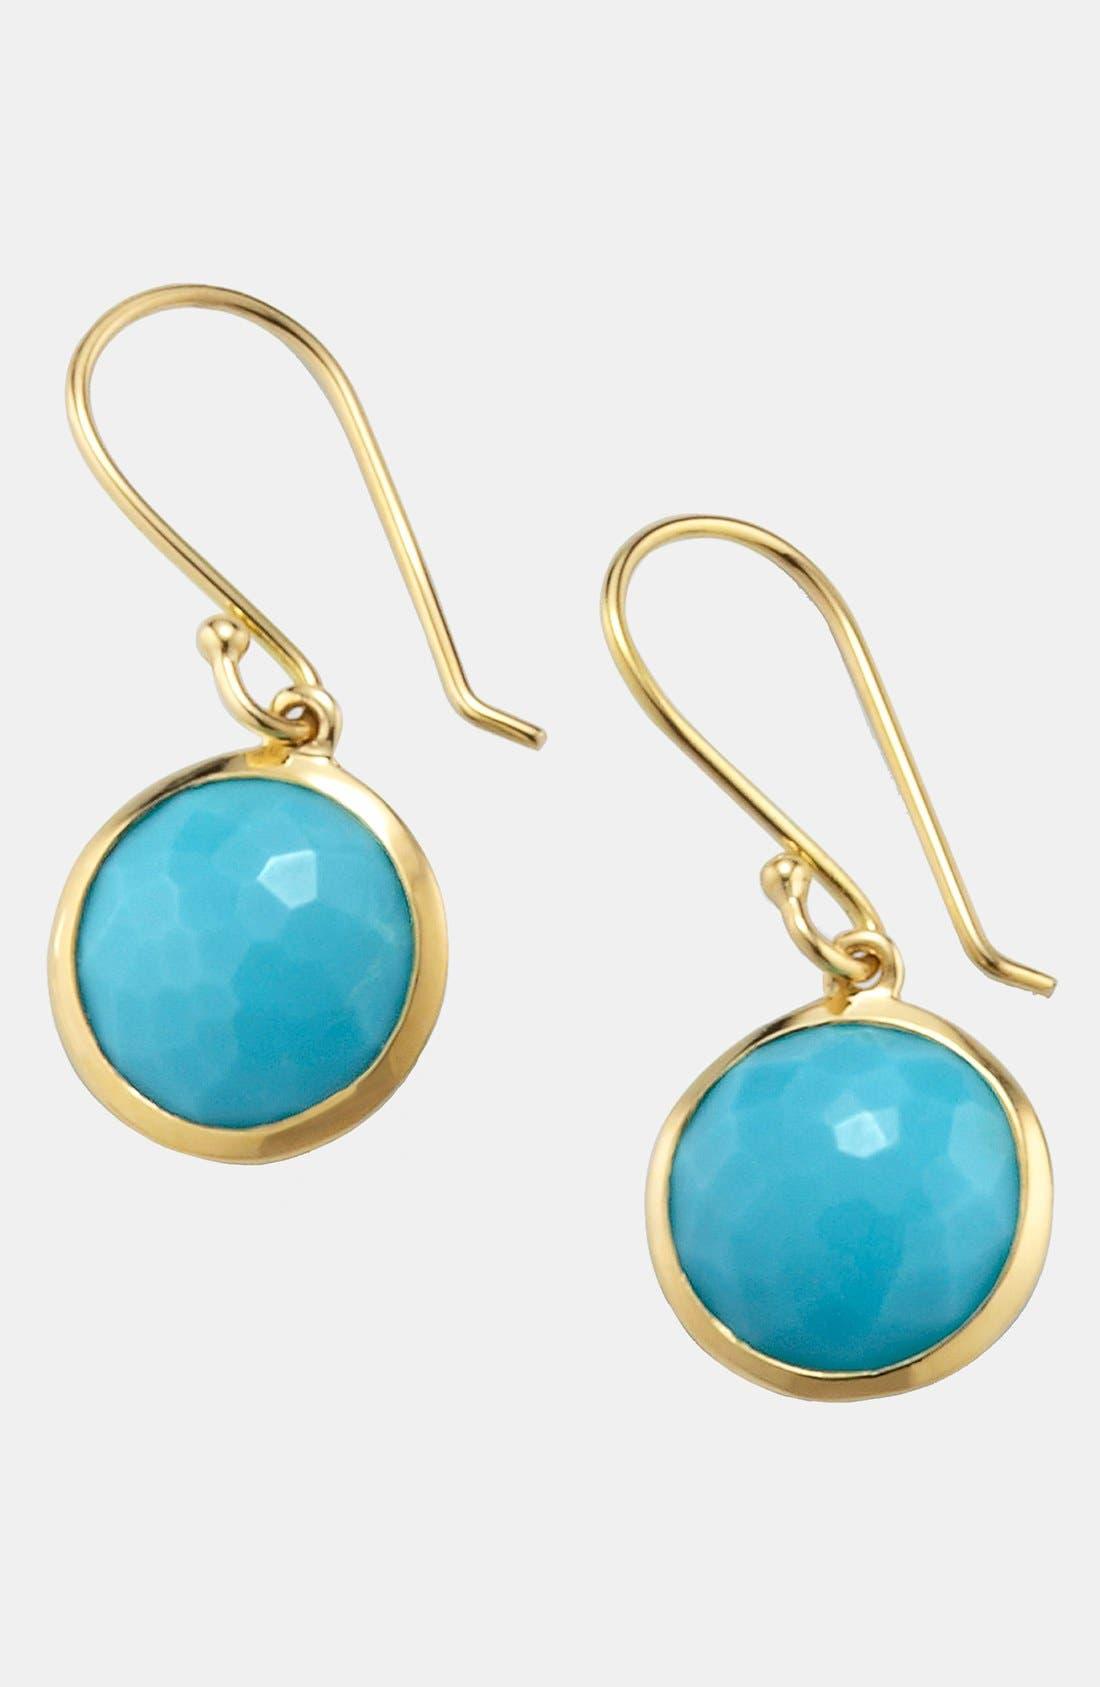 'Rock Candy - Mini Lollipop' 18k Gold Drop Earrings,                             Main thumbnail 1, color,                             YELLOW GOLD/TURQUOISE